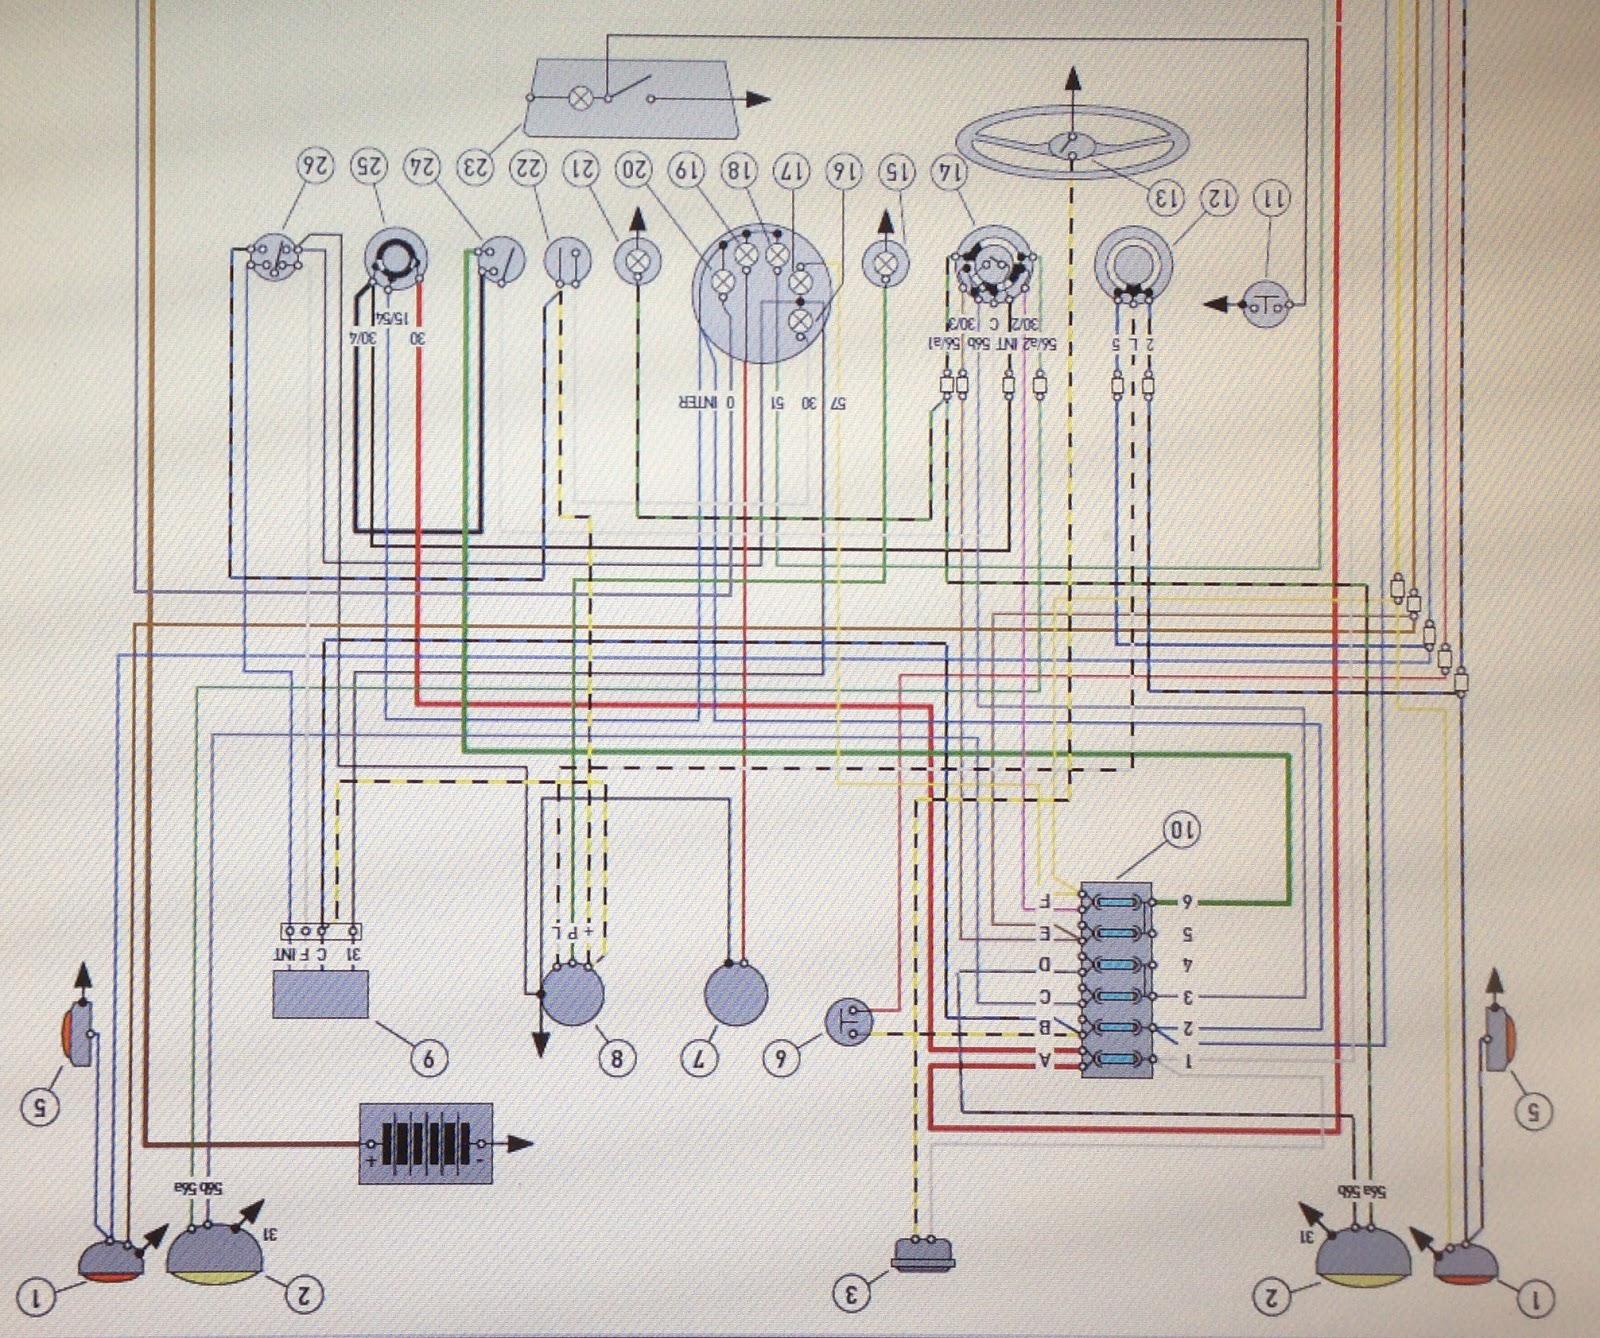 Farm Tractor Wiring Diagrams | Wiring Diagram on fiat 600 tractor, polaris 600 wiring diagram, ktm 600 wiring diagram, fiat 600 engine, fiat 600 steering diagram, fiat spider wiring diagram, fiat 124 wiring diagram, fiat multipla wiring diagram, ford 600 wiring diagram, fiat 600 seats, bobcat 600 wiring diagram, fiat uno wiring diagram, fiat 500 wiring diagram, fiat 600 cylinder head, fiat 600 parts, fiat 600 oil filter, fiat ducato wiring diagram,